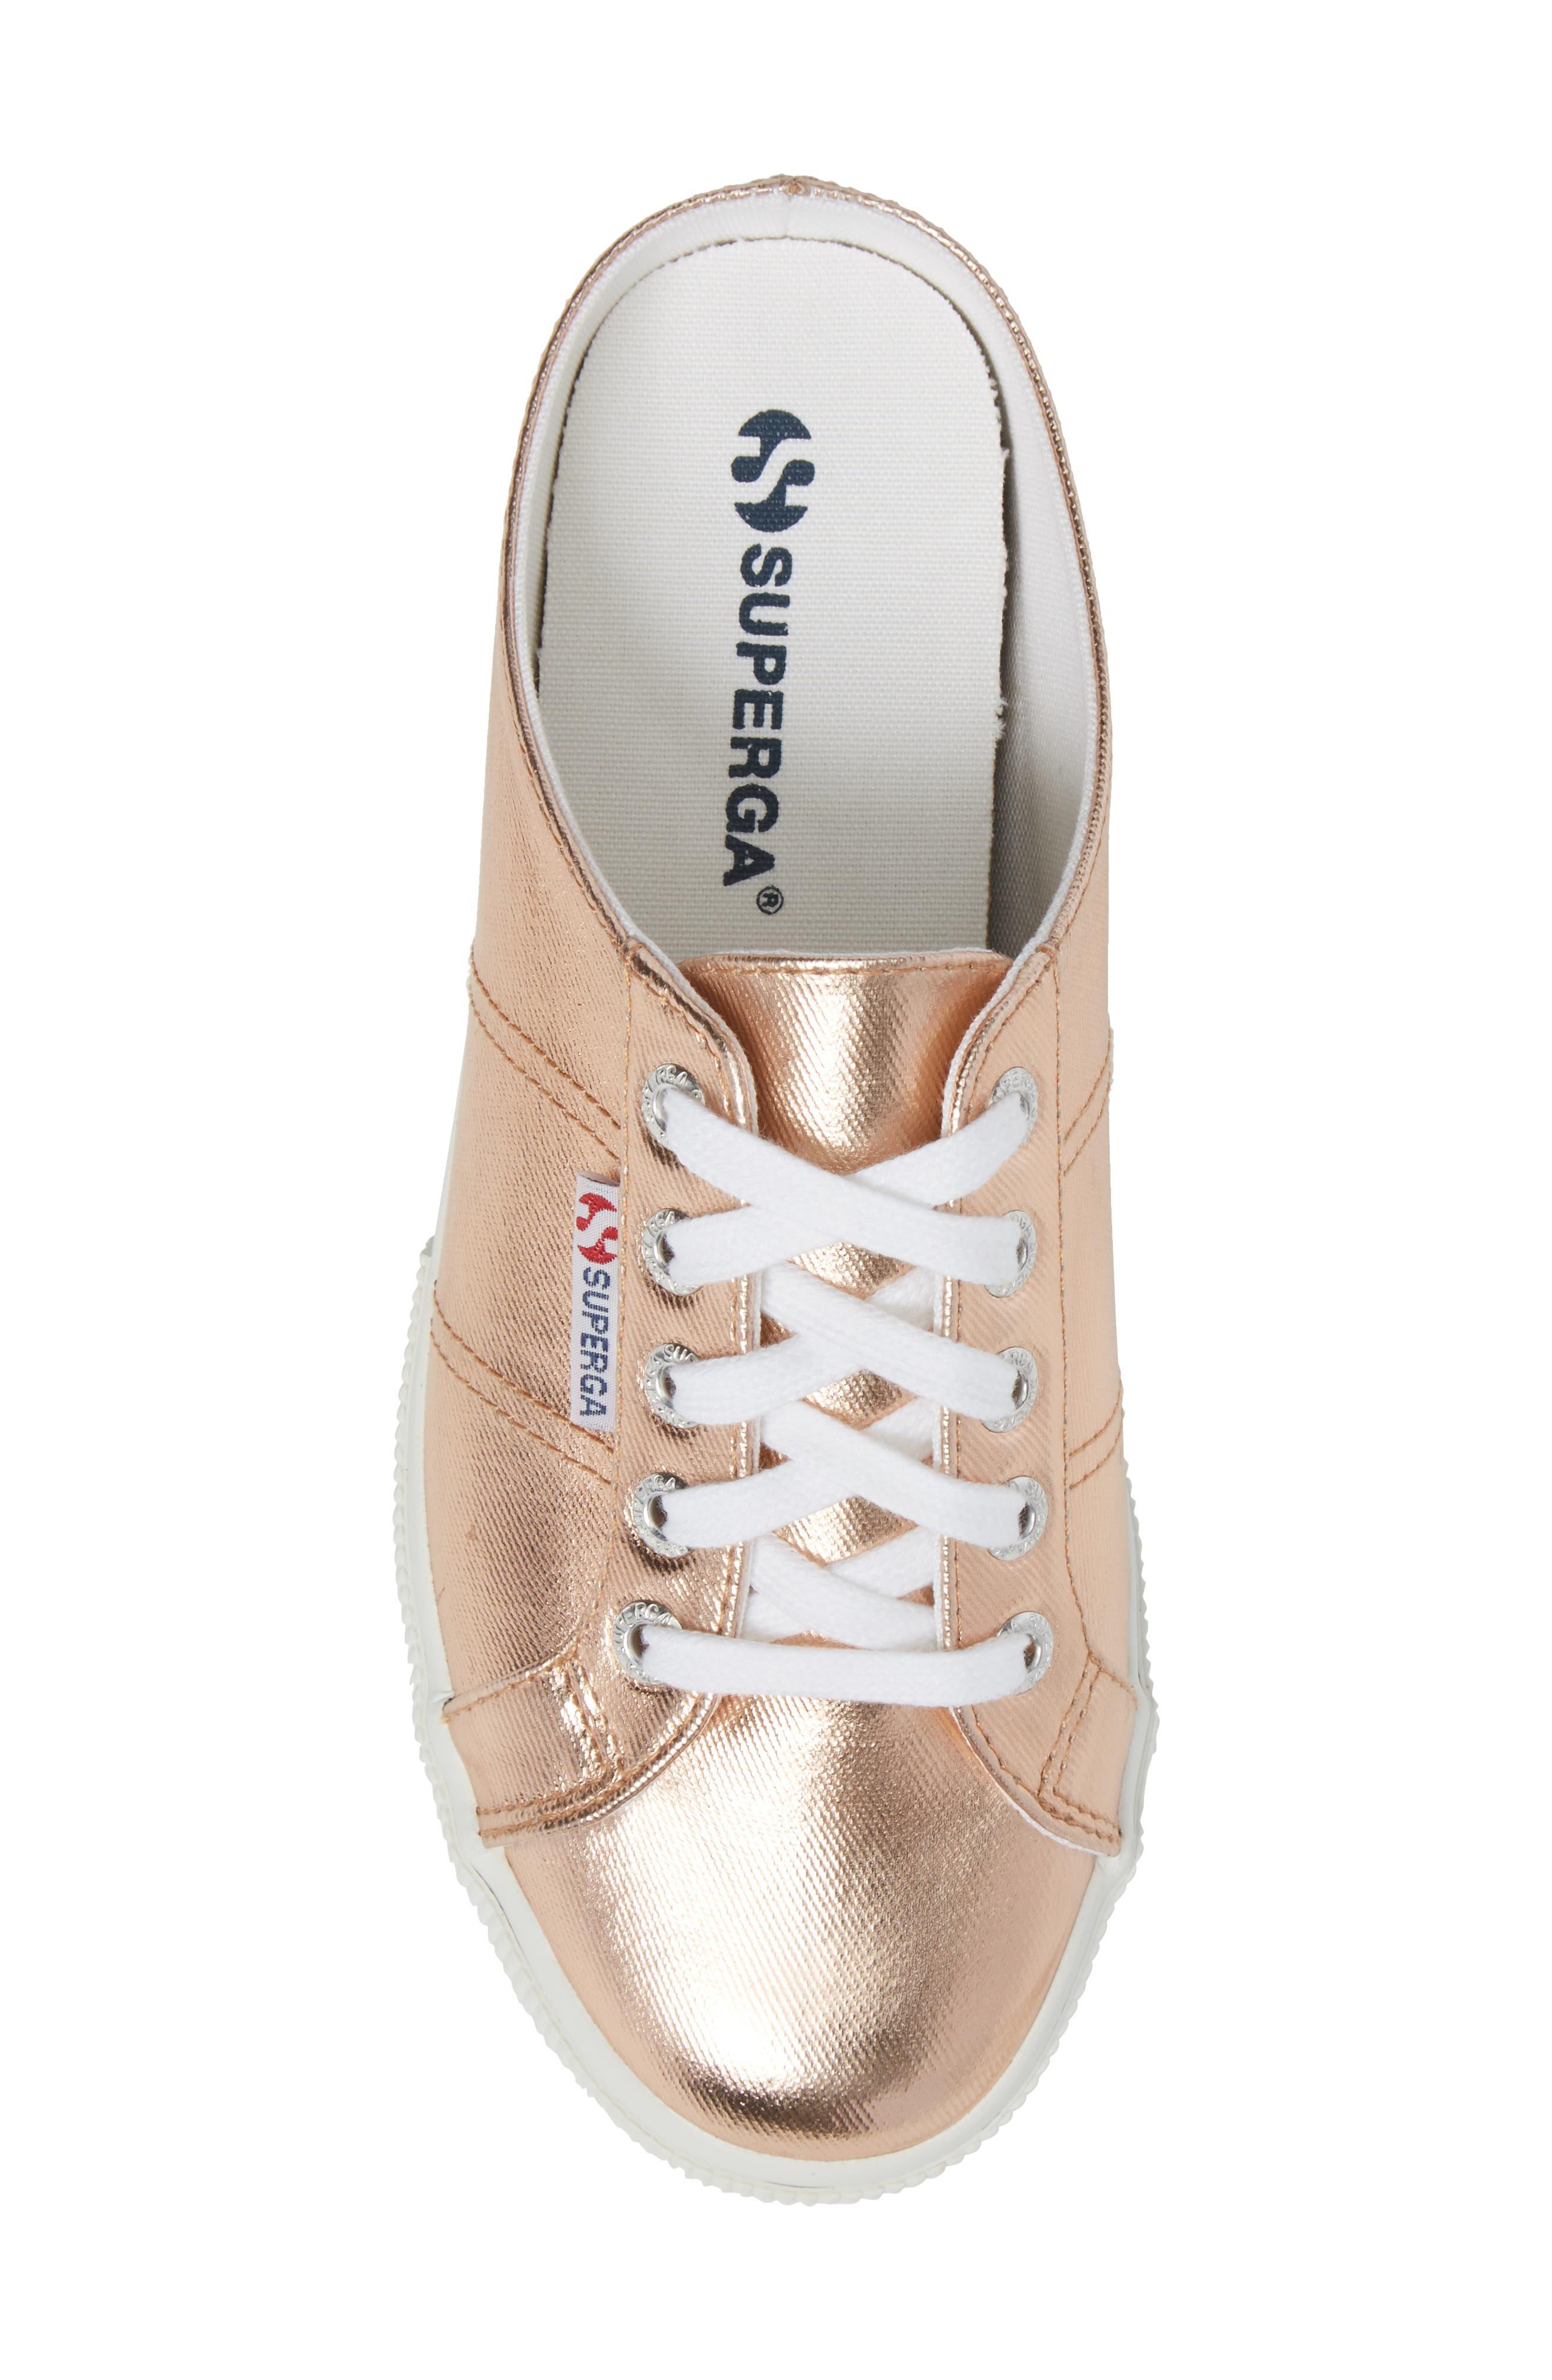 2288 Sneaker Mule,                             Alternate thumbnail 5, color,                             Rose Gold